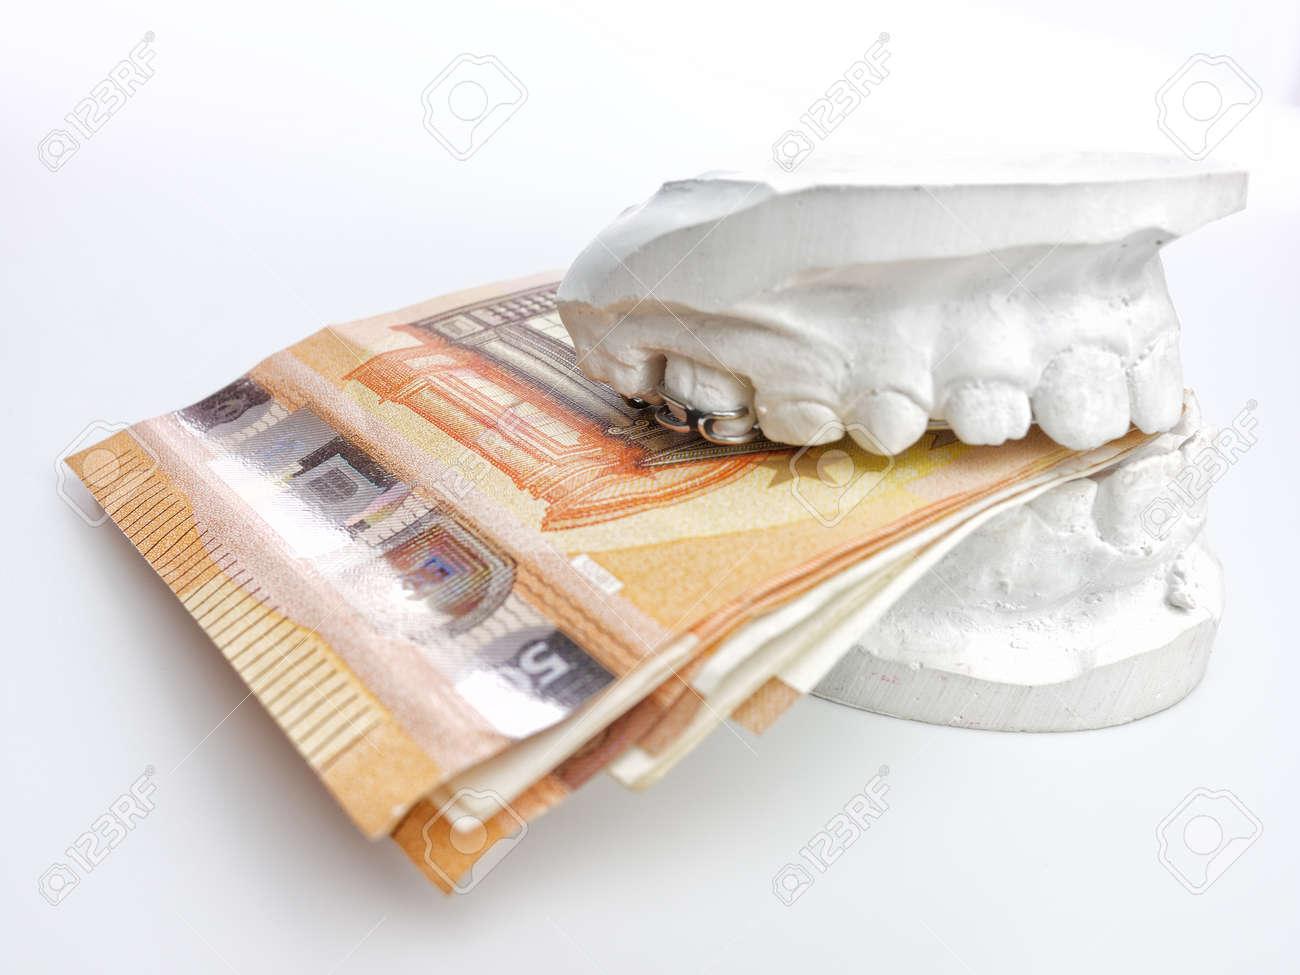 Closeup kid orthodontic dental impression chalk model biting euro money on white background - 155476591